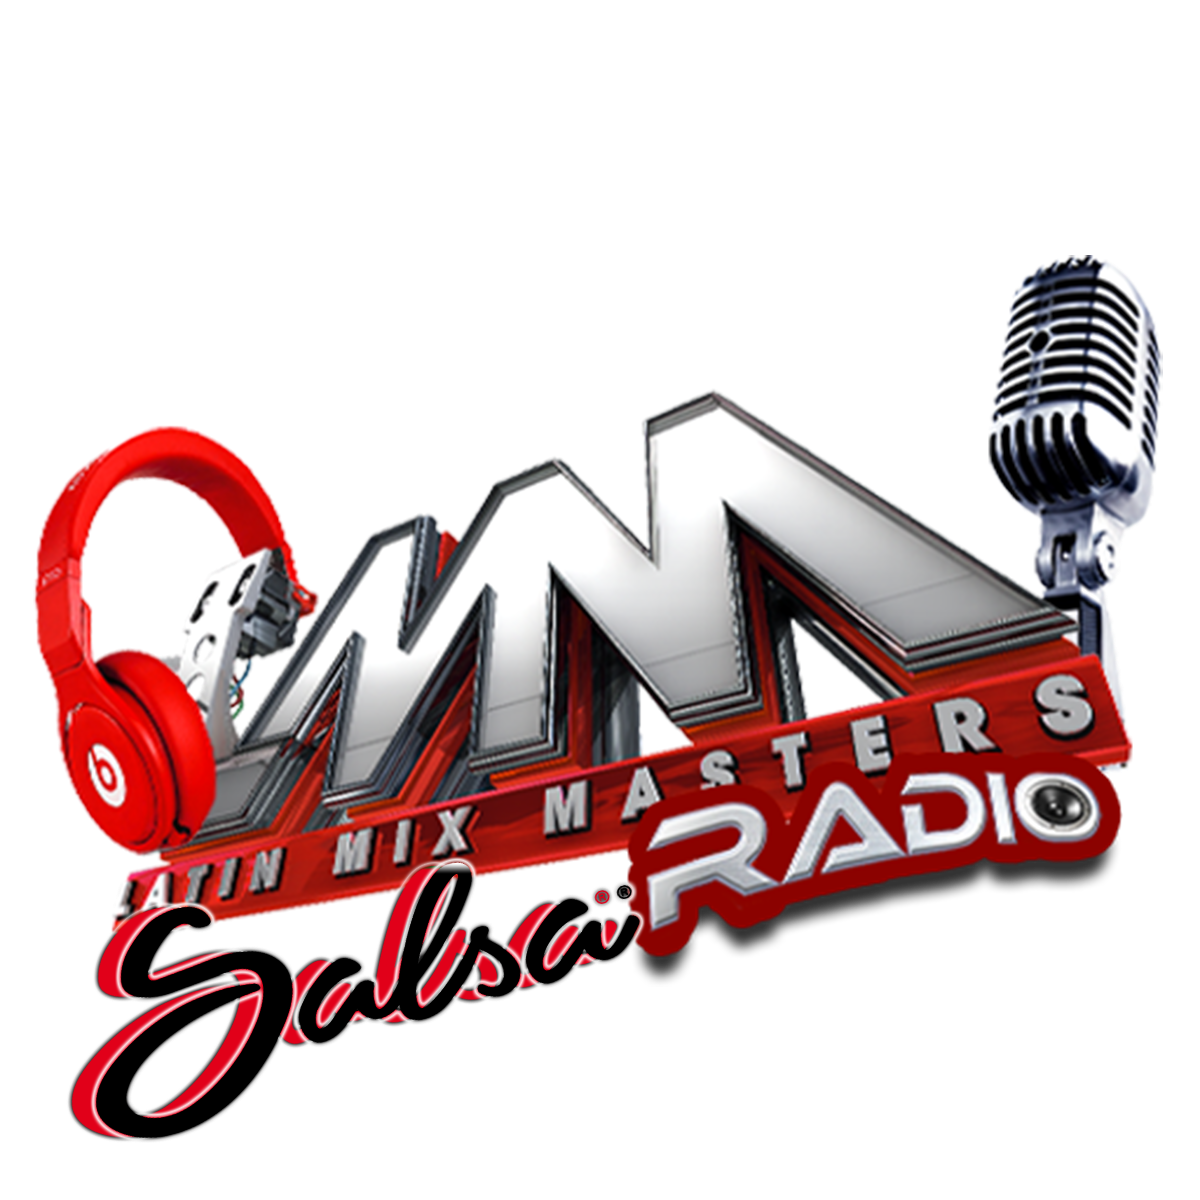 LMM Salsa Radio - 100% Pura Salsa - Live Djs - MixMastersdj.com